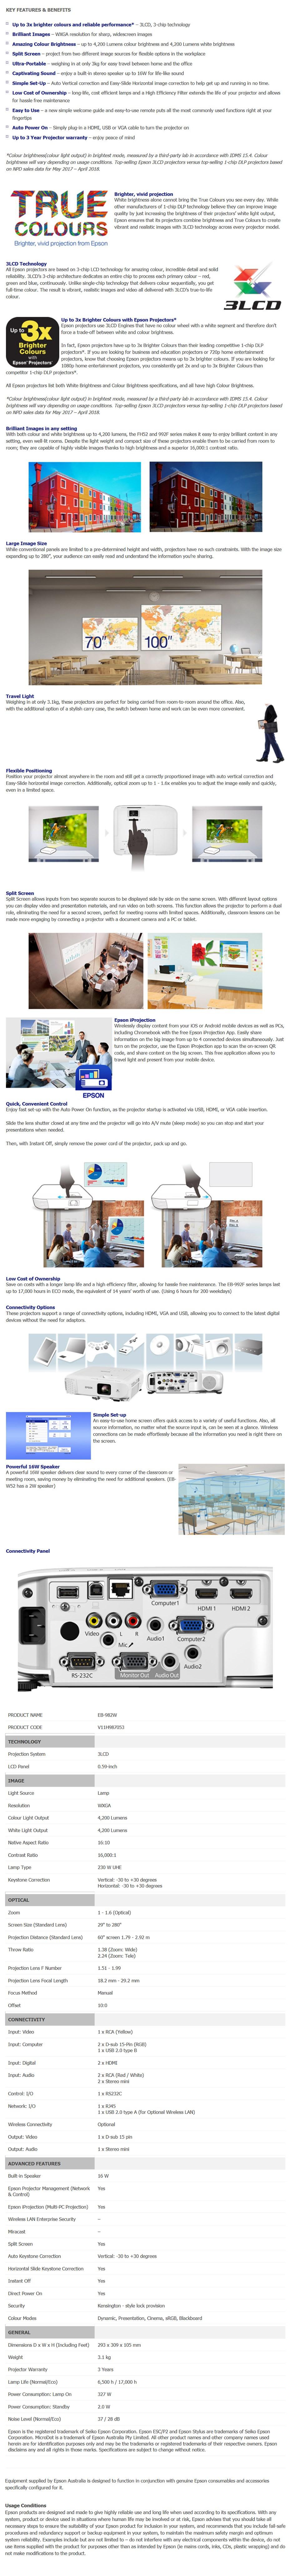 Epson EB-982W WXGA 3LCD Corporate Portable Multimedia Projector - Overview 1